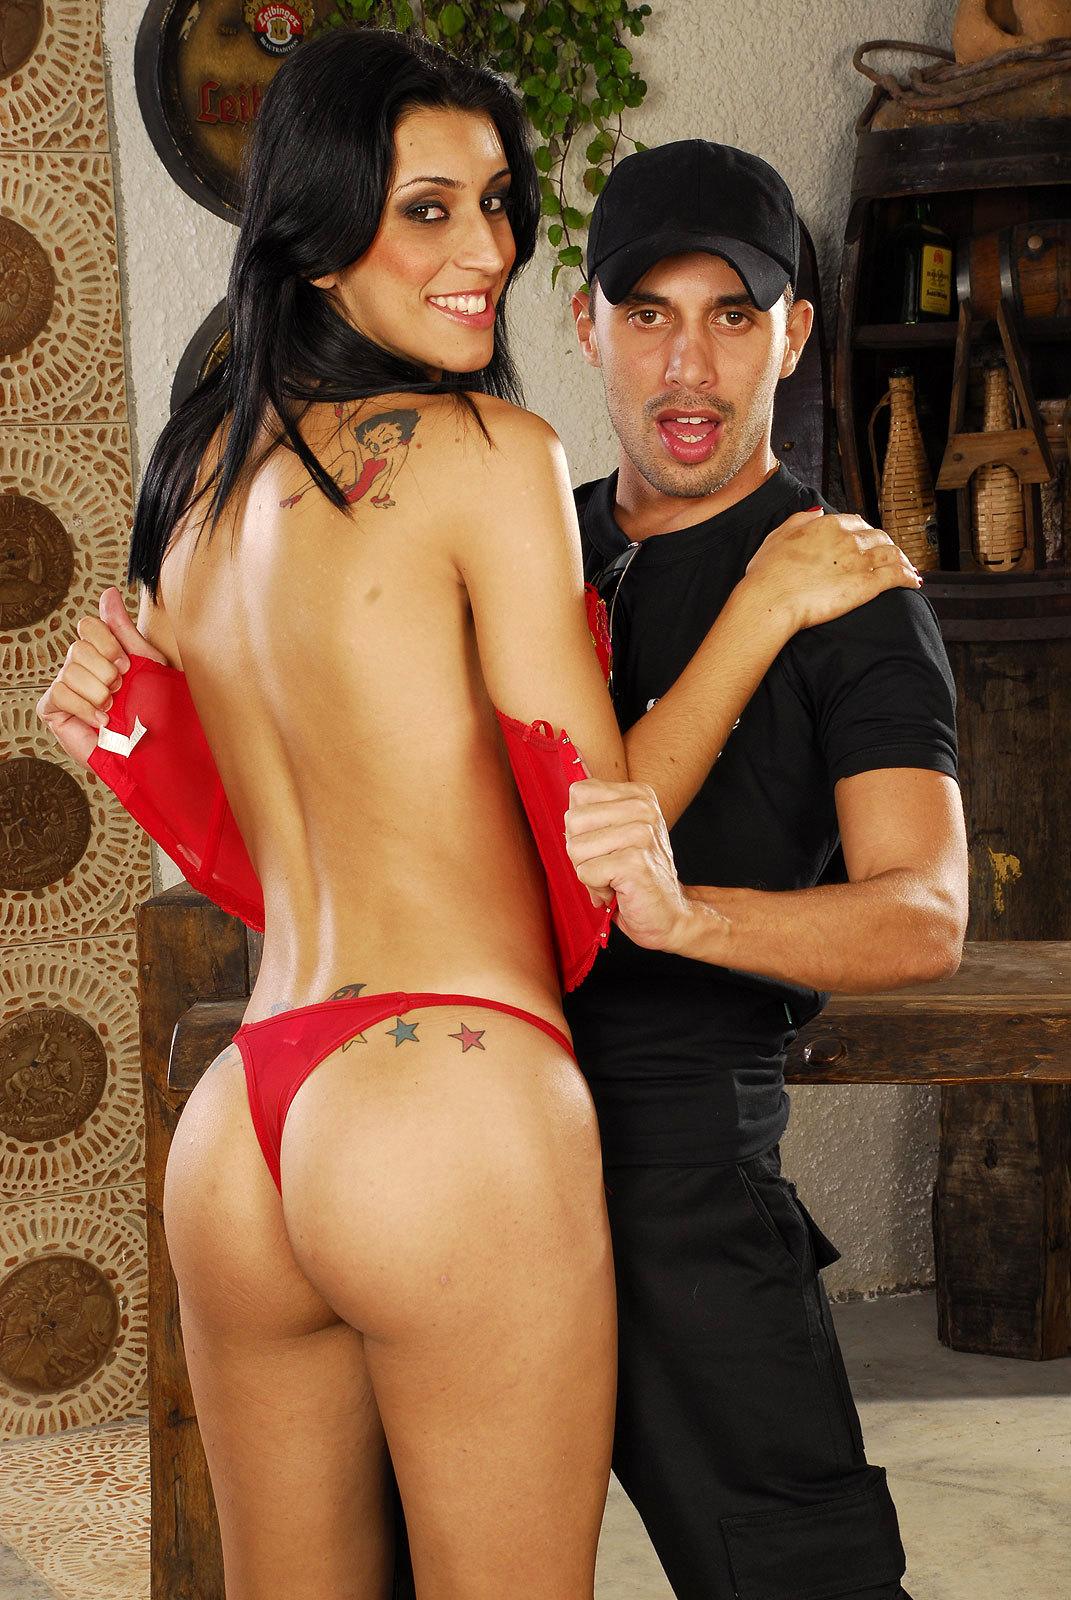 Massive Tit Tgirl Barbara Vasconcellos Gets Destroyed Raw